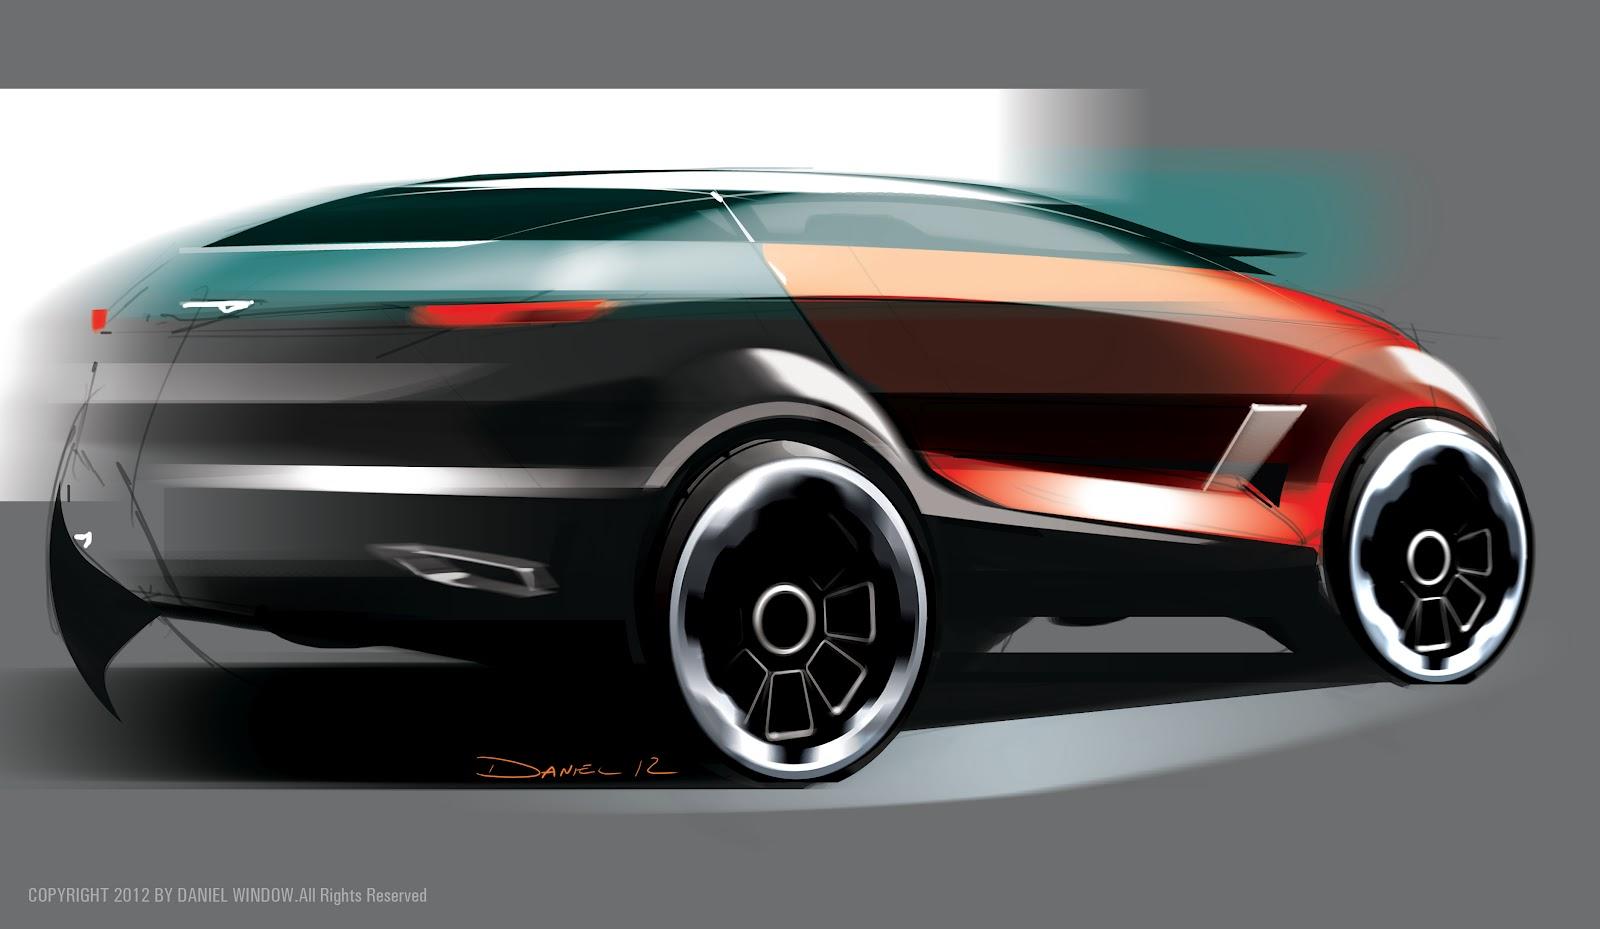 Dan Window Vehicle Design